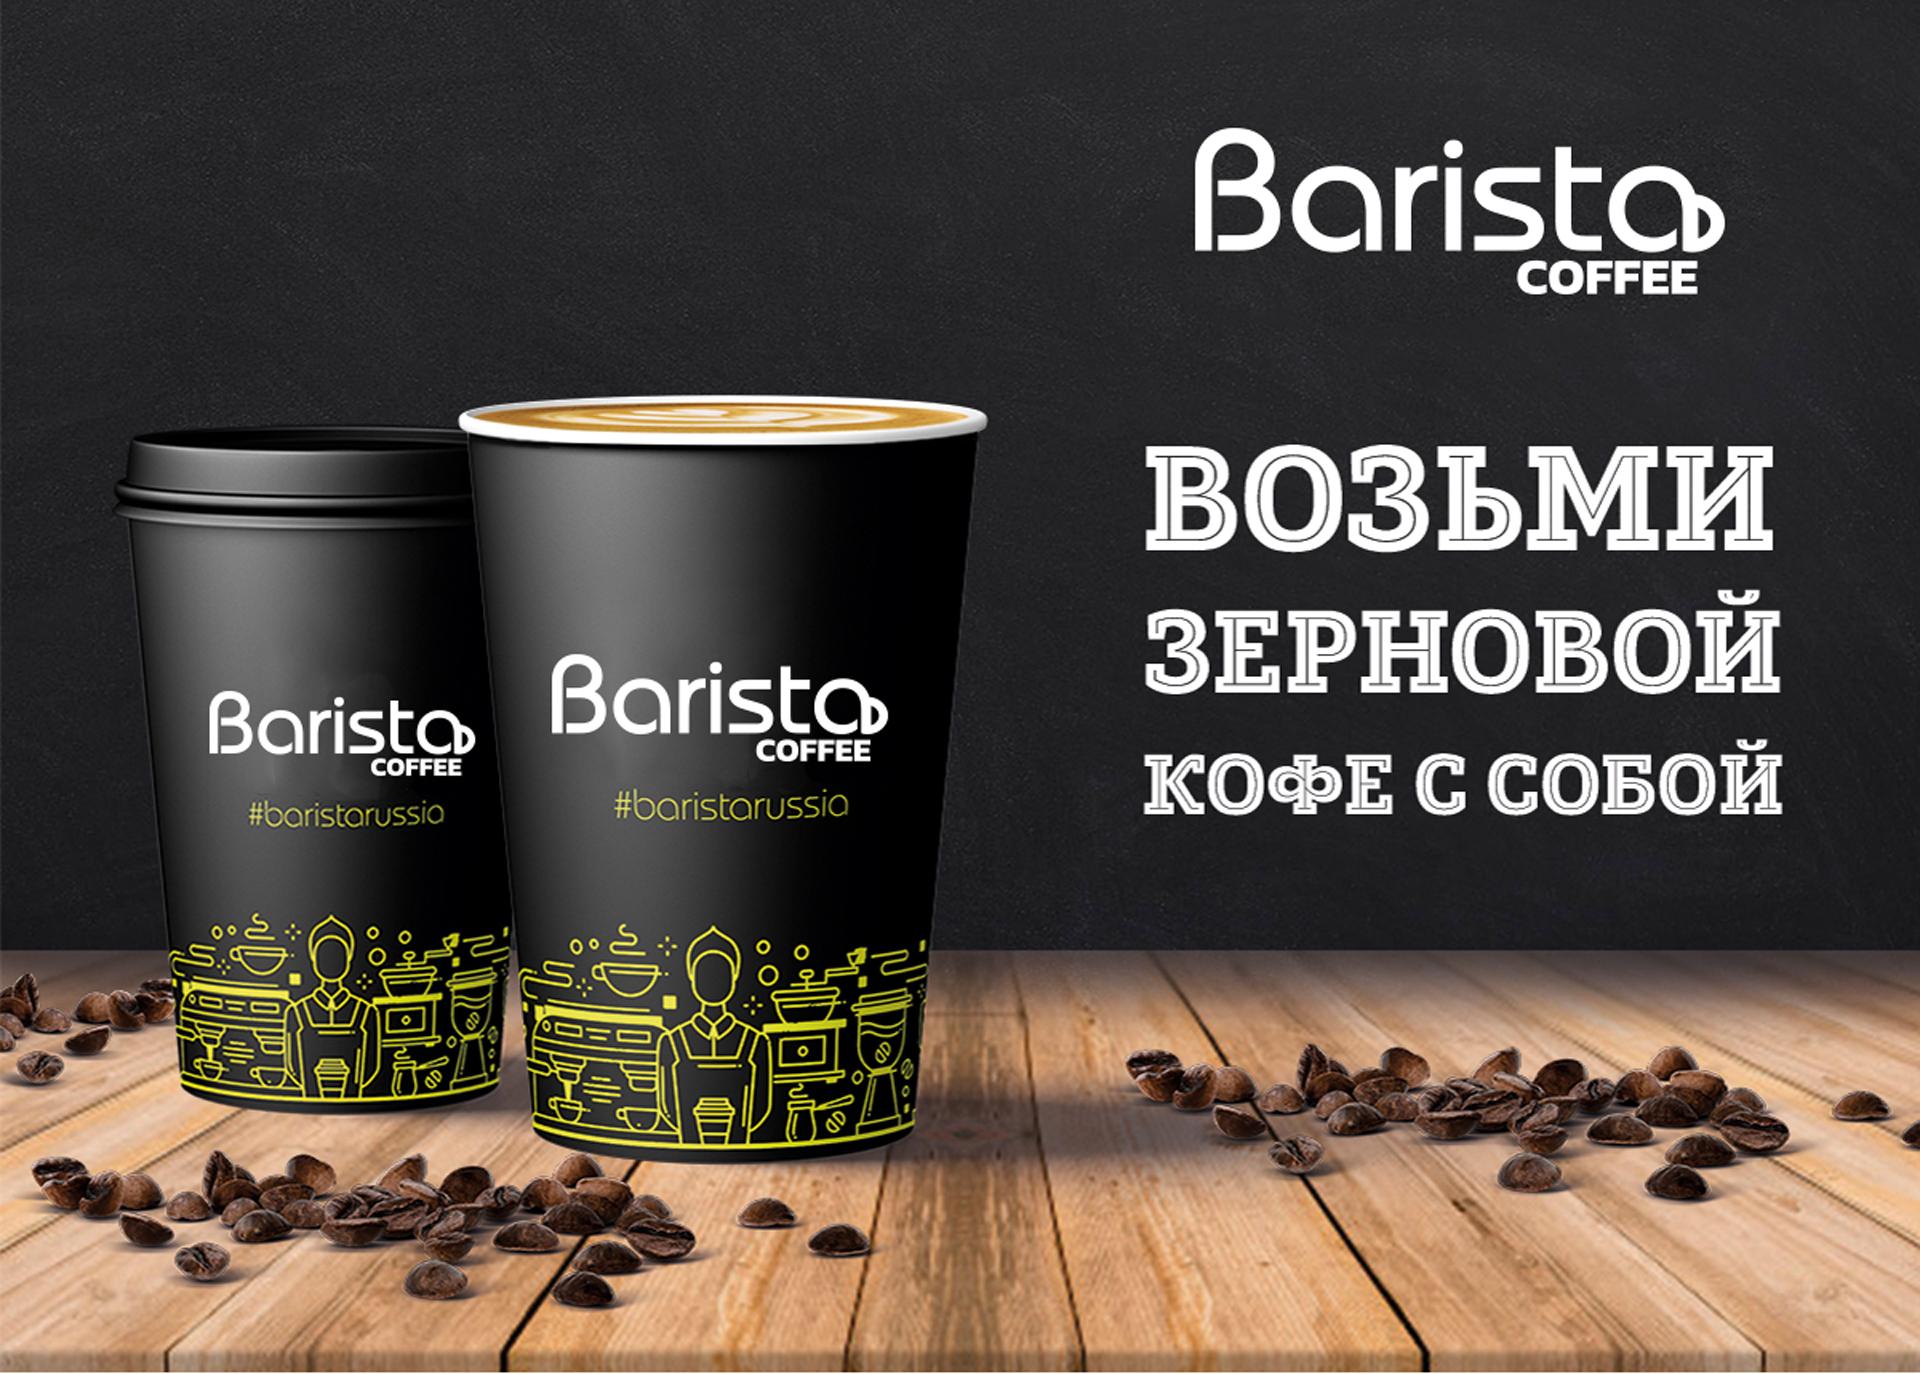 Ребрендинг логотипа сети кофеен фото f_0895e7ff4ae13960.jpg